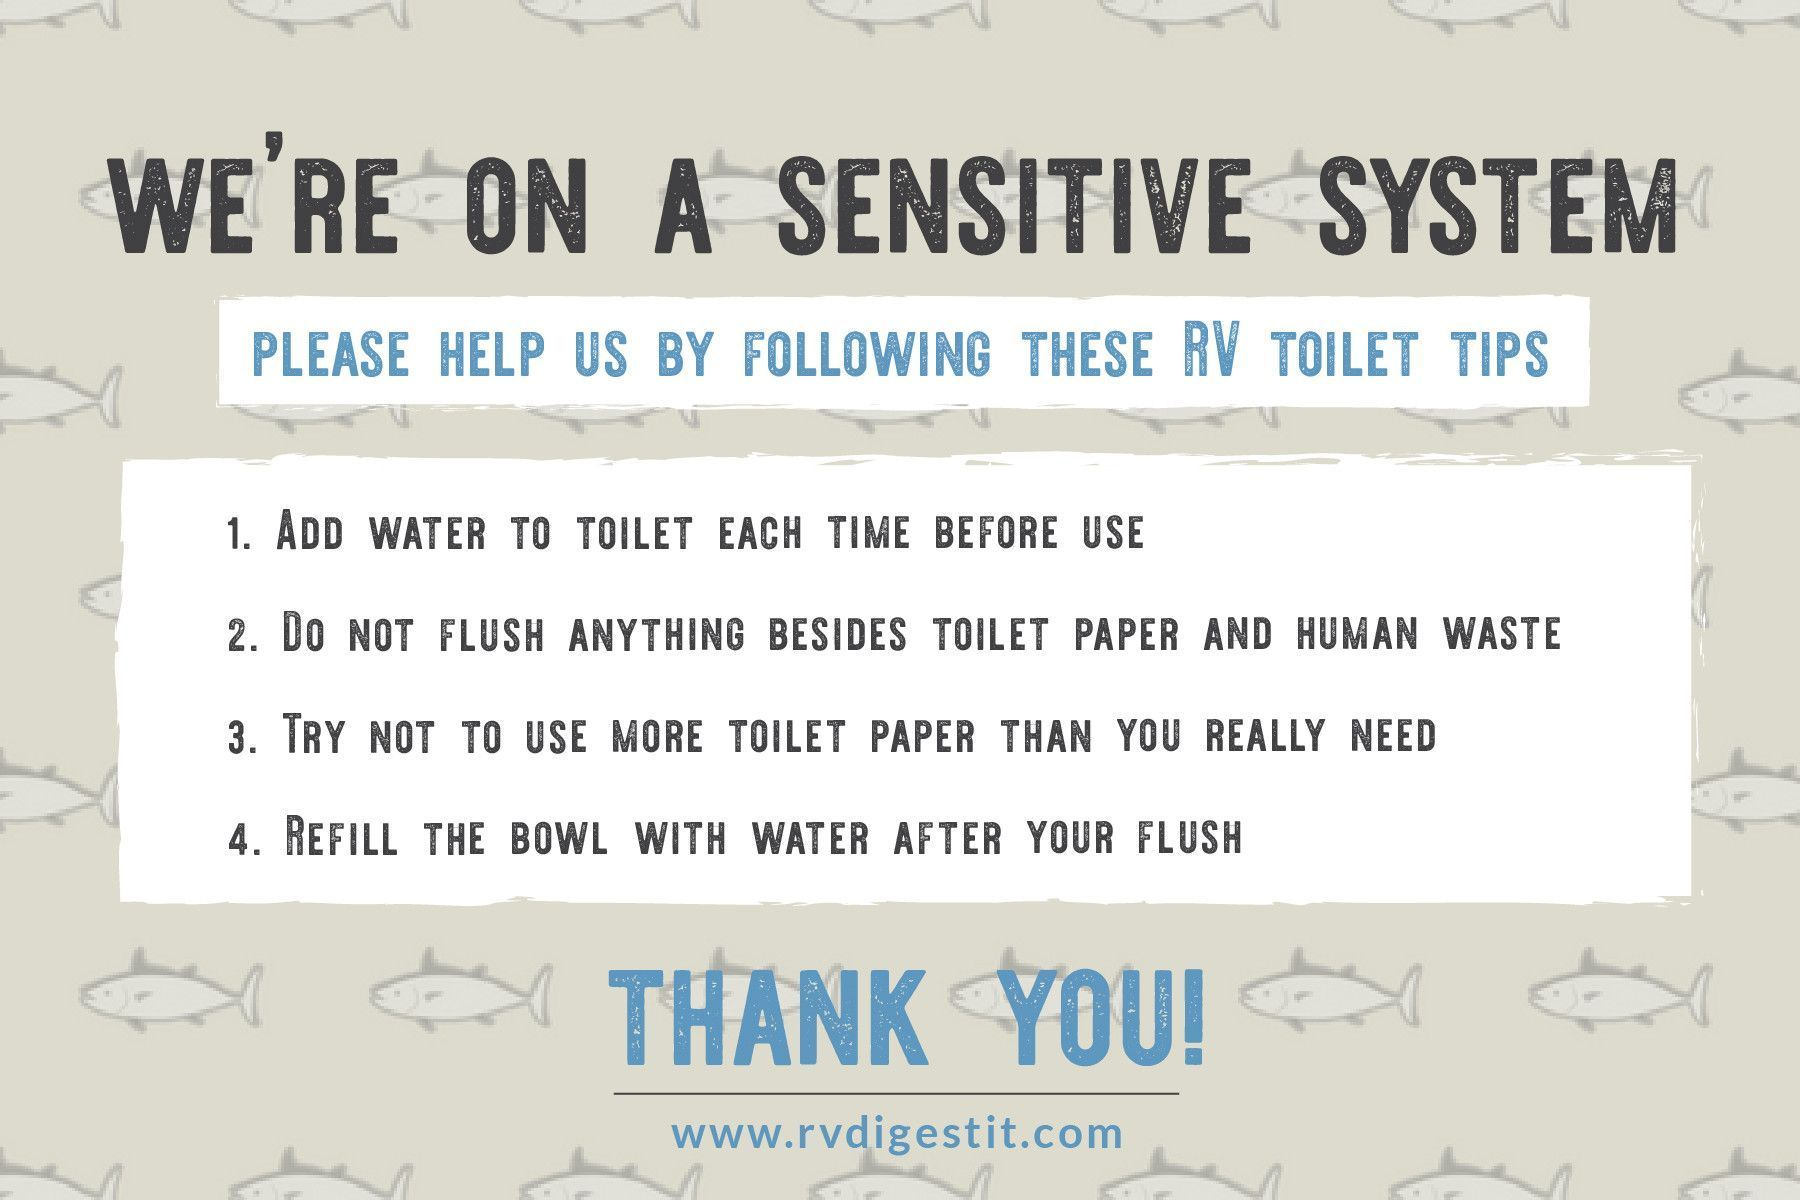 Rv Bathroom Toilet Rules Sign Fish 6 X 4 Bathroomtoilets